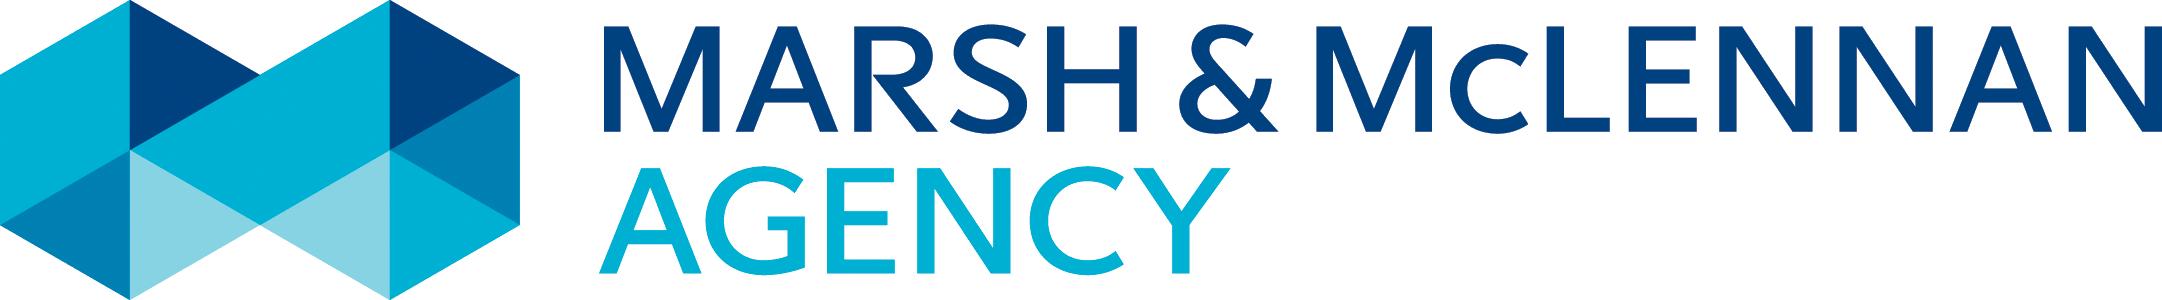 Marsh McLennan Agency Healthcare logo